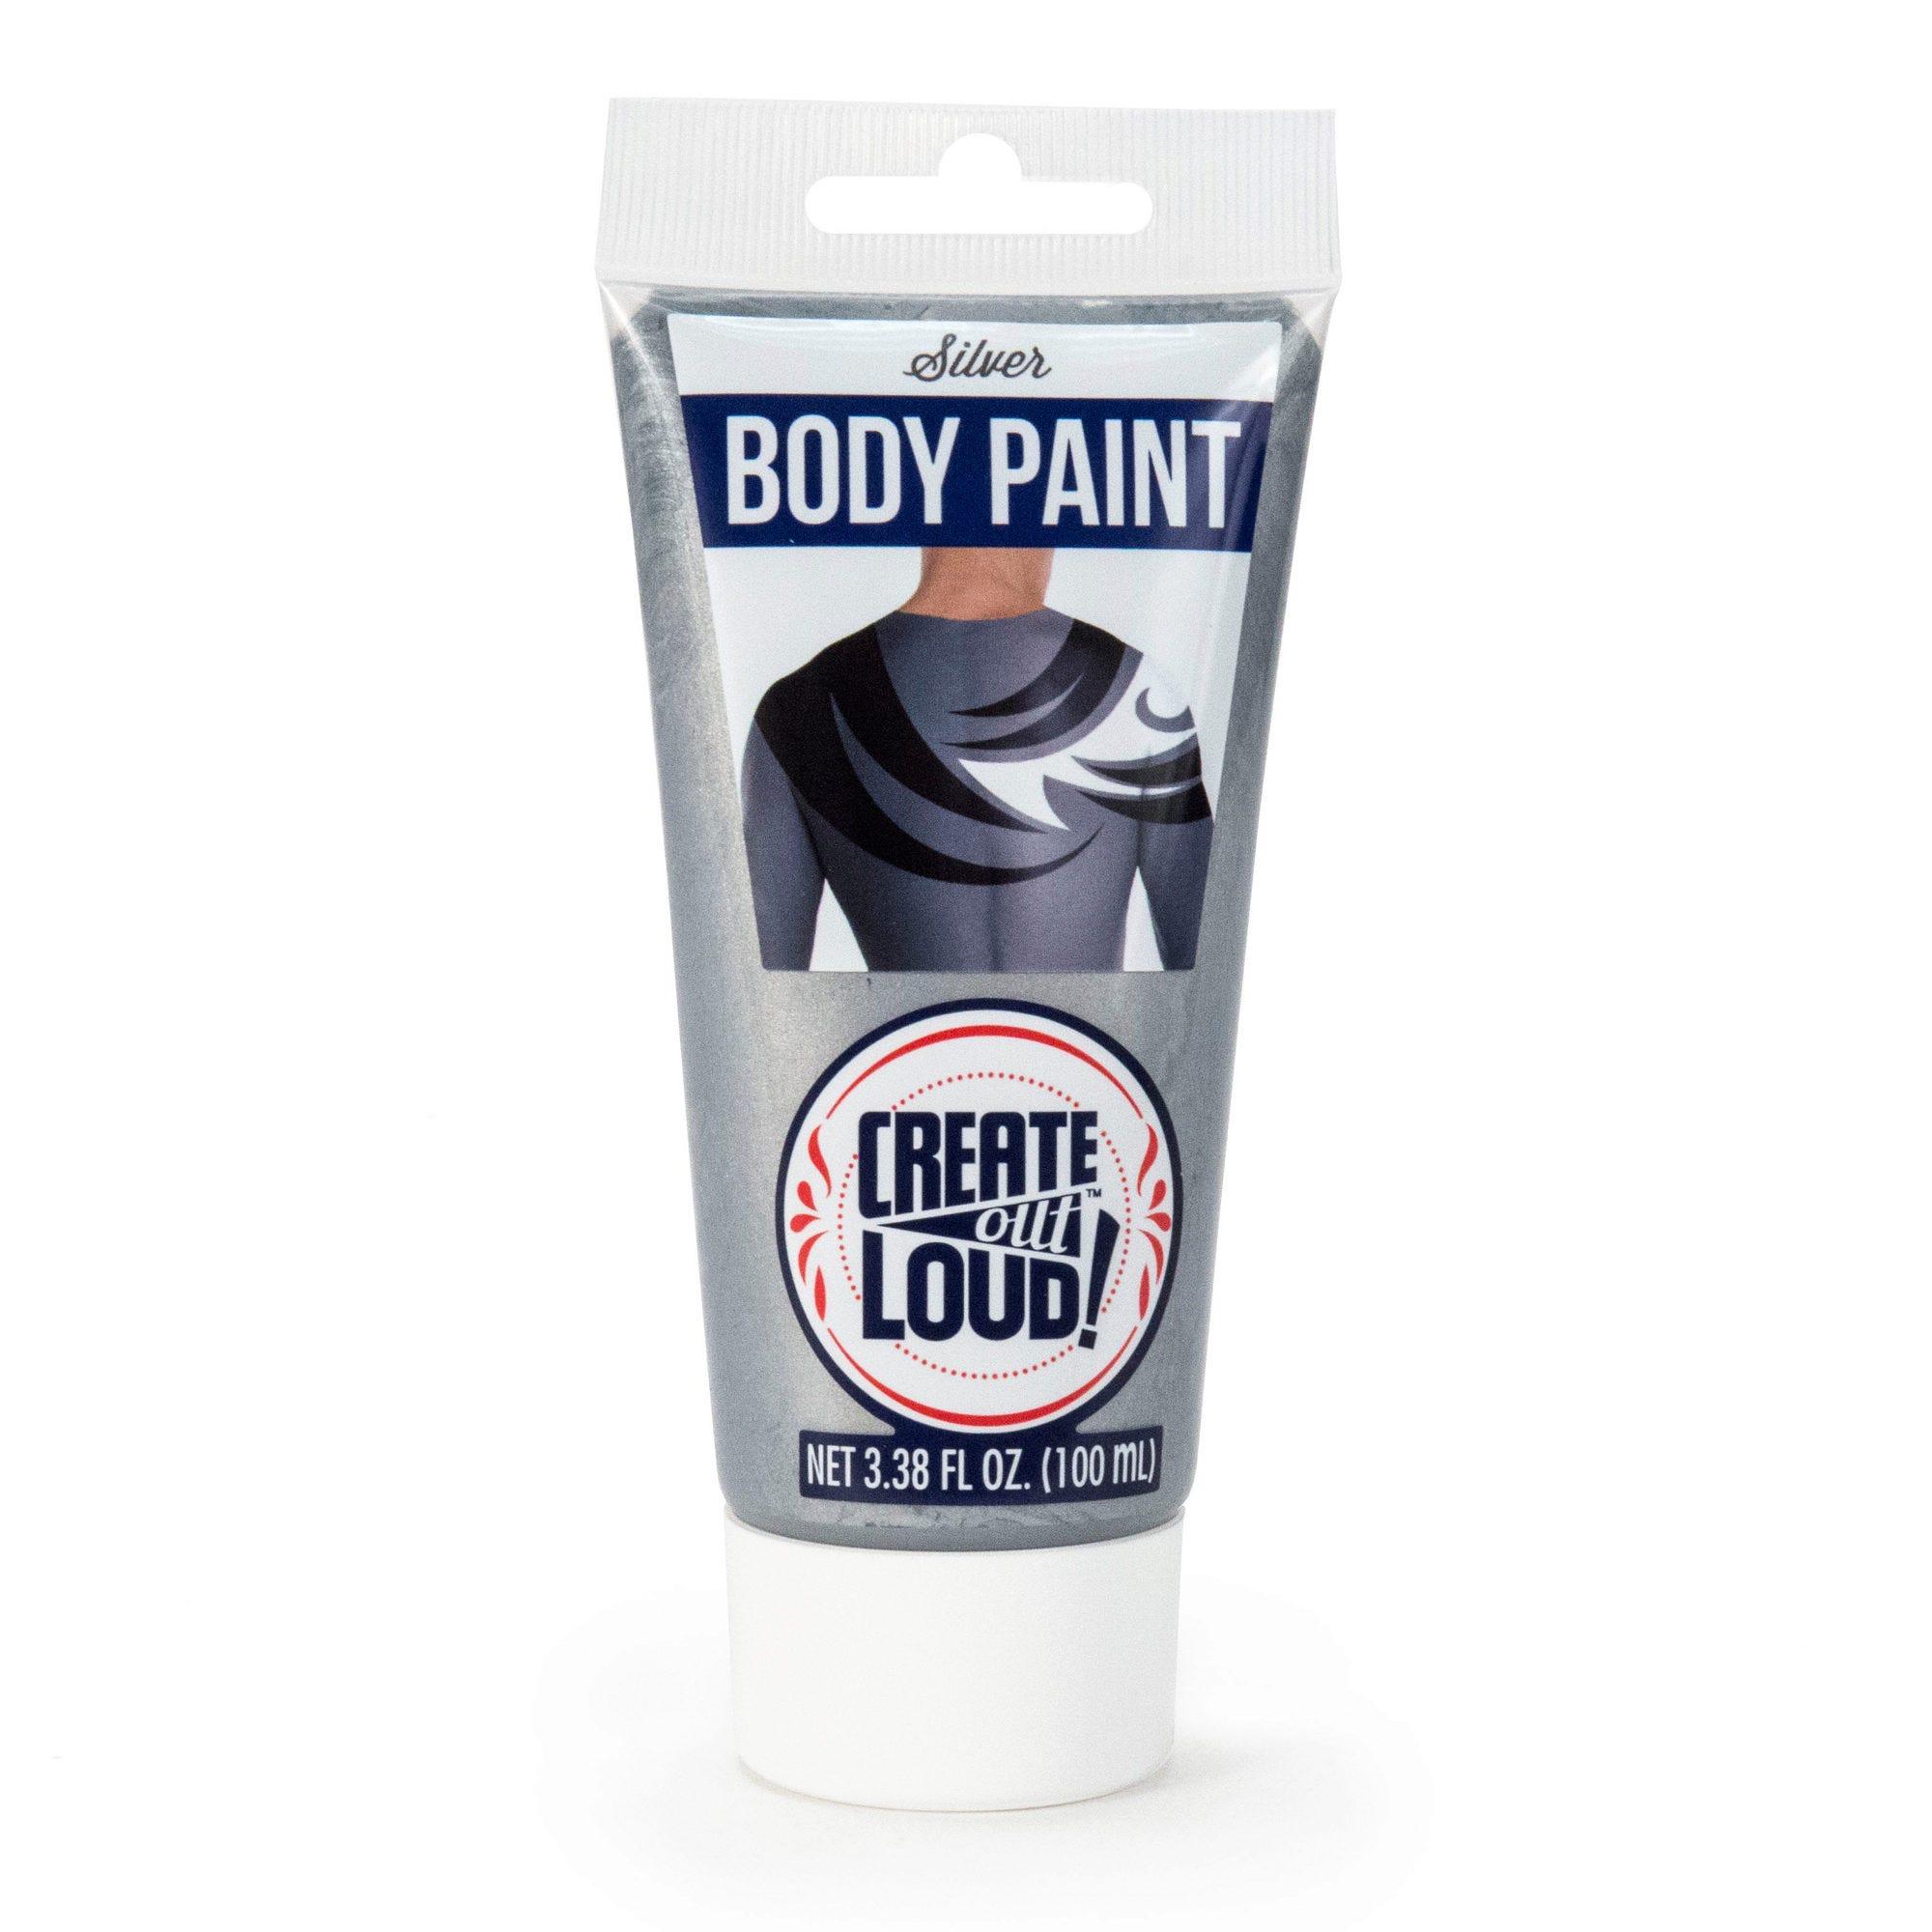 Body PAINT 3.38 Fl Oz - Silver